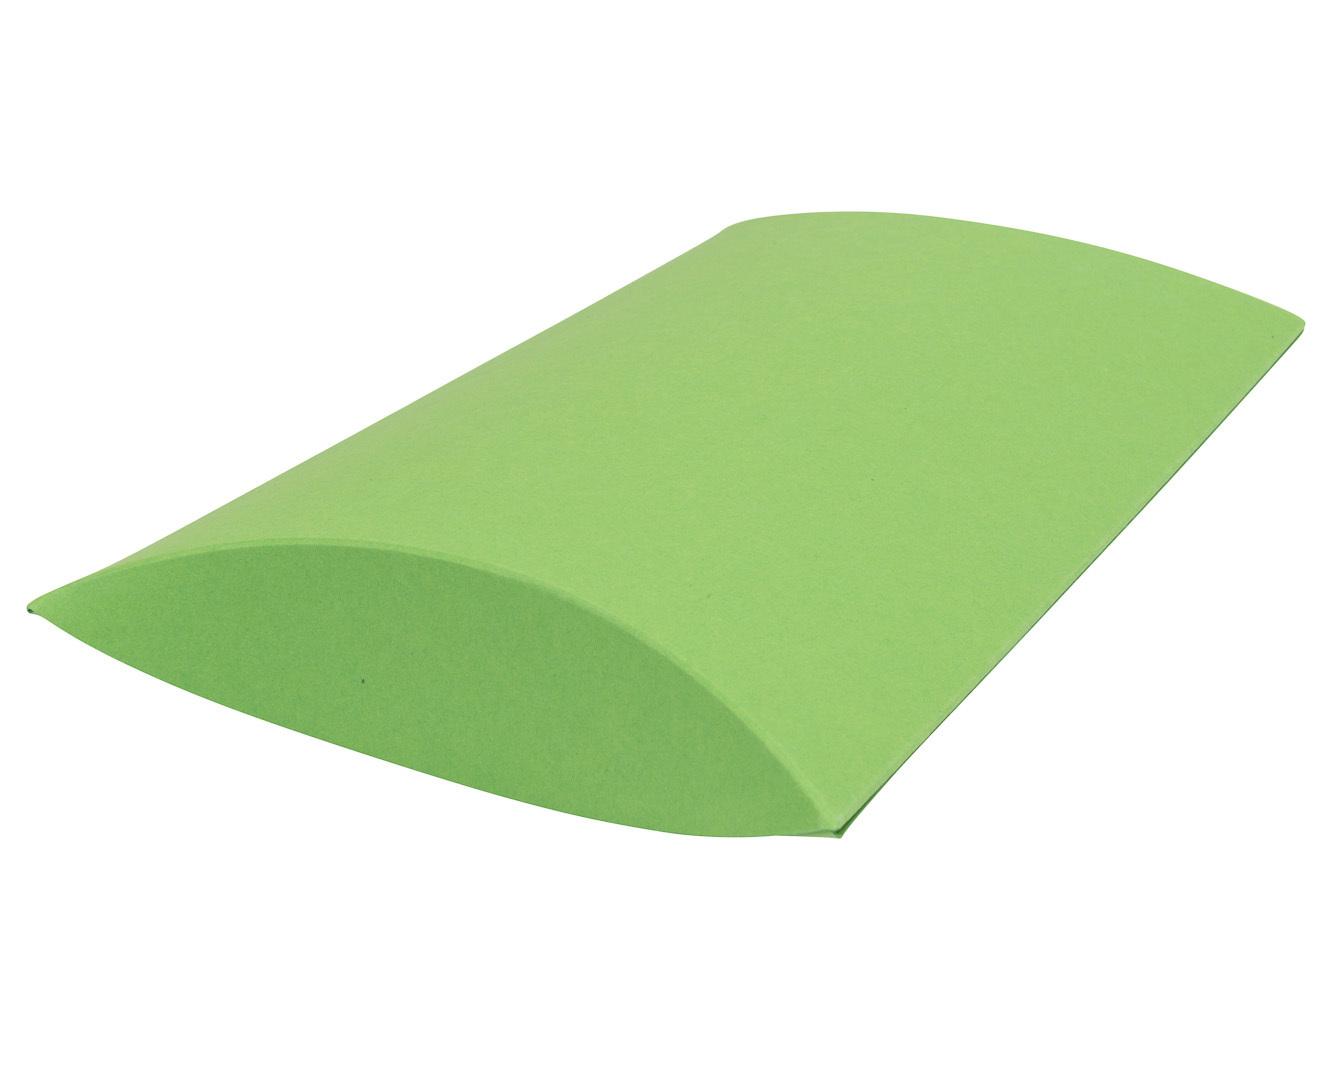 BUNTBOX Pillow Box M - Apple